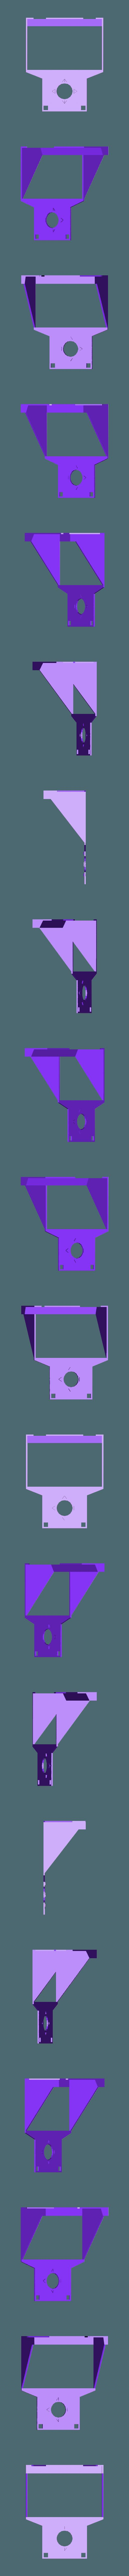 1.stl Download free STL file MARBLE BOY automat • 3D printer object, Janis_Bruchwalski